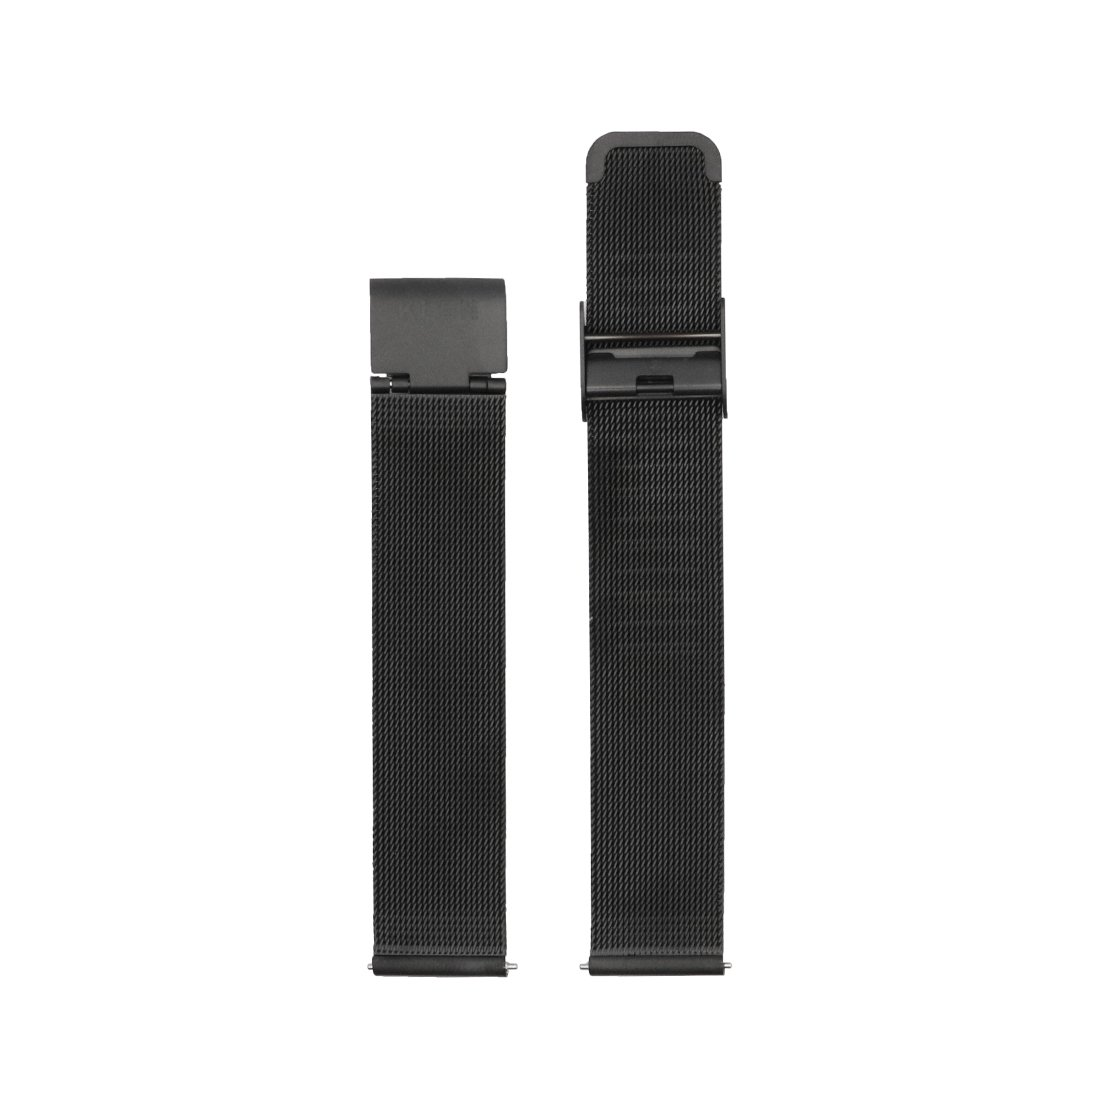 KLON WATCH REPLACEMENT STRAP -BLACK MESH- 18mm